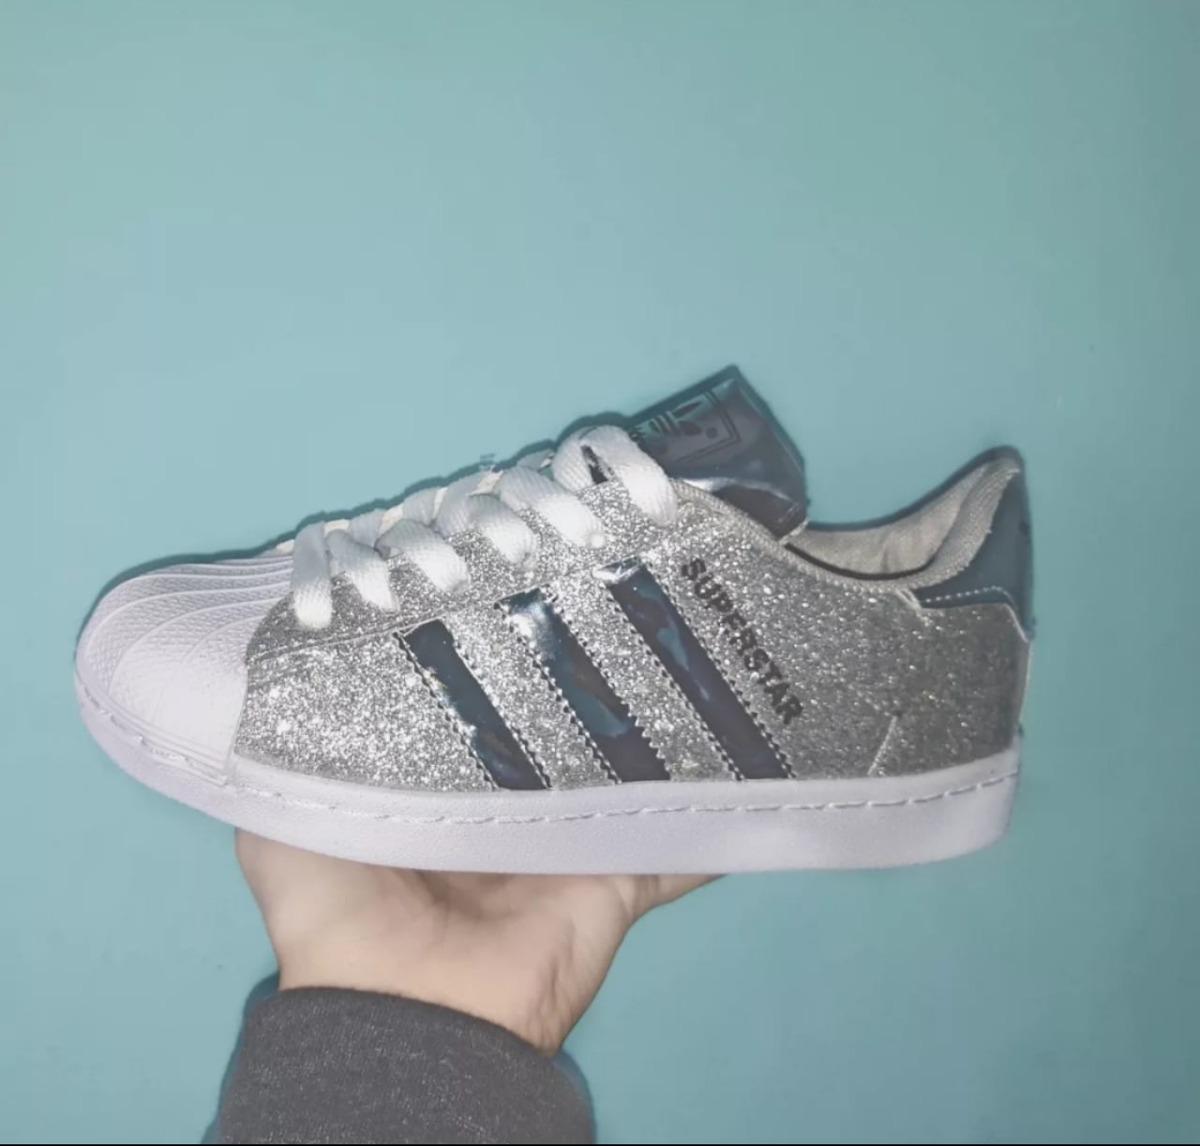 694702e9339 ... wholesale zapatillas adidas superstar glitter. cargando zoom. efc96  d06f9